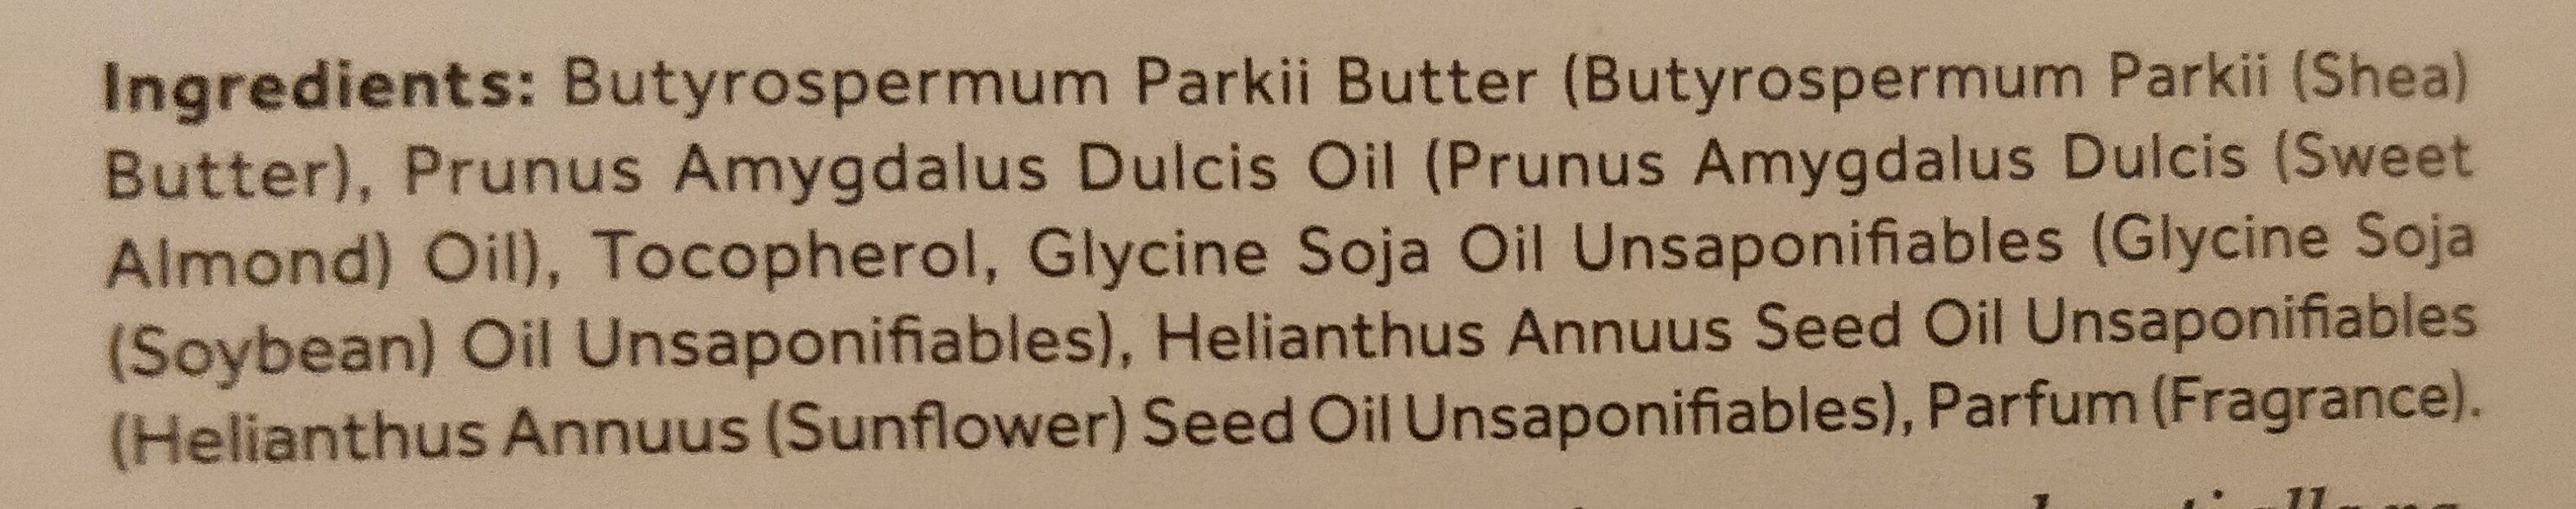 Burro di karité - Ingredients - it